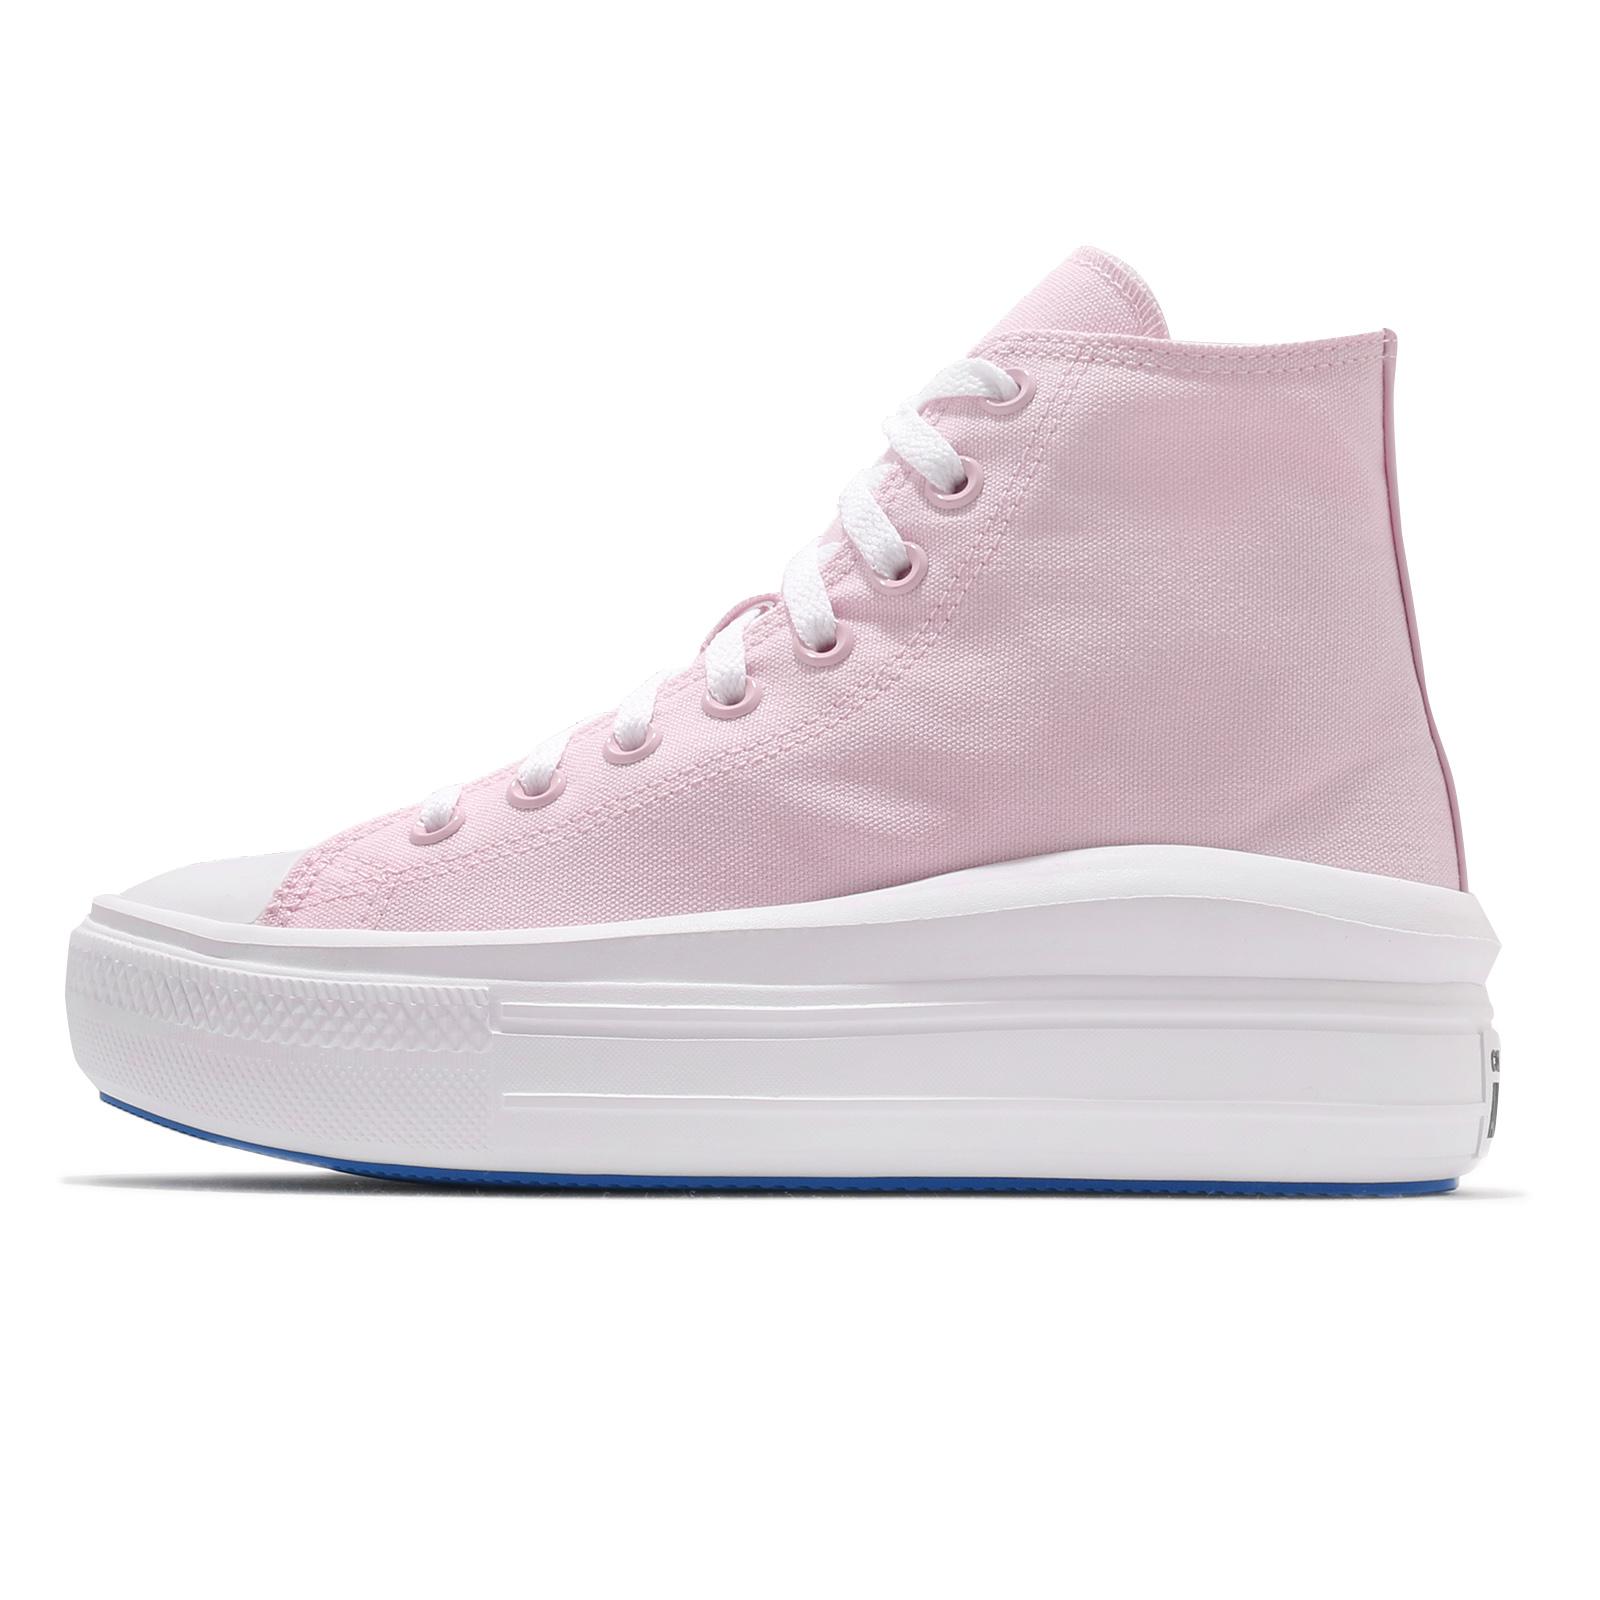 Converse 帆布鞋 Chuck Taylor All Star Move 粉紅 淡粉 女鞋 厚底 增高 【ACS】